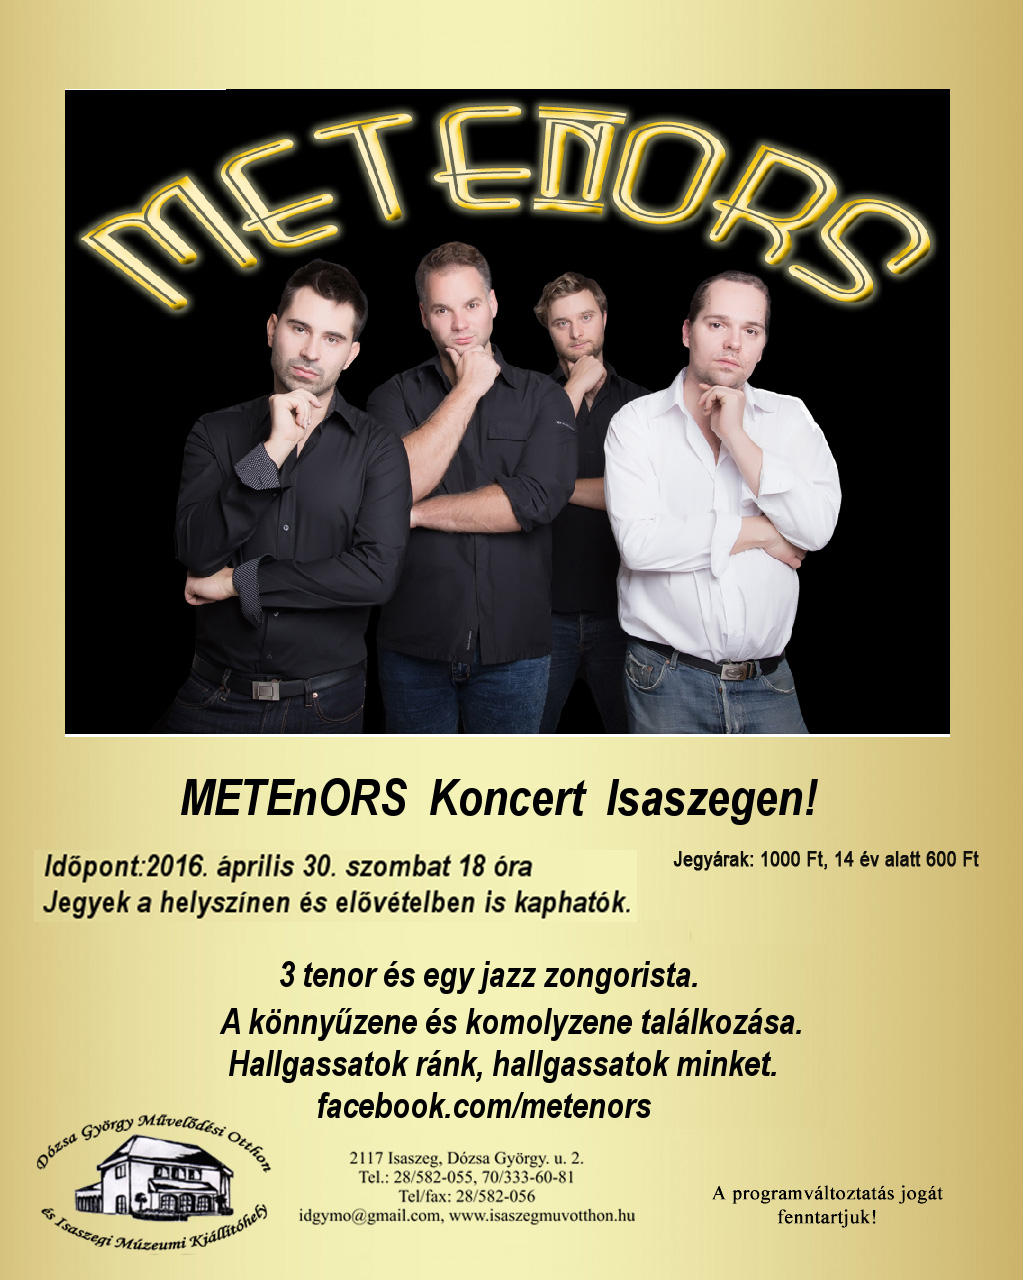 MeteNors